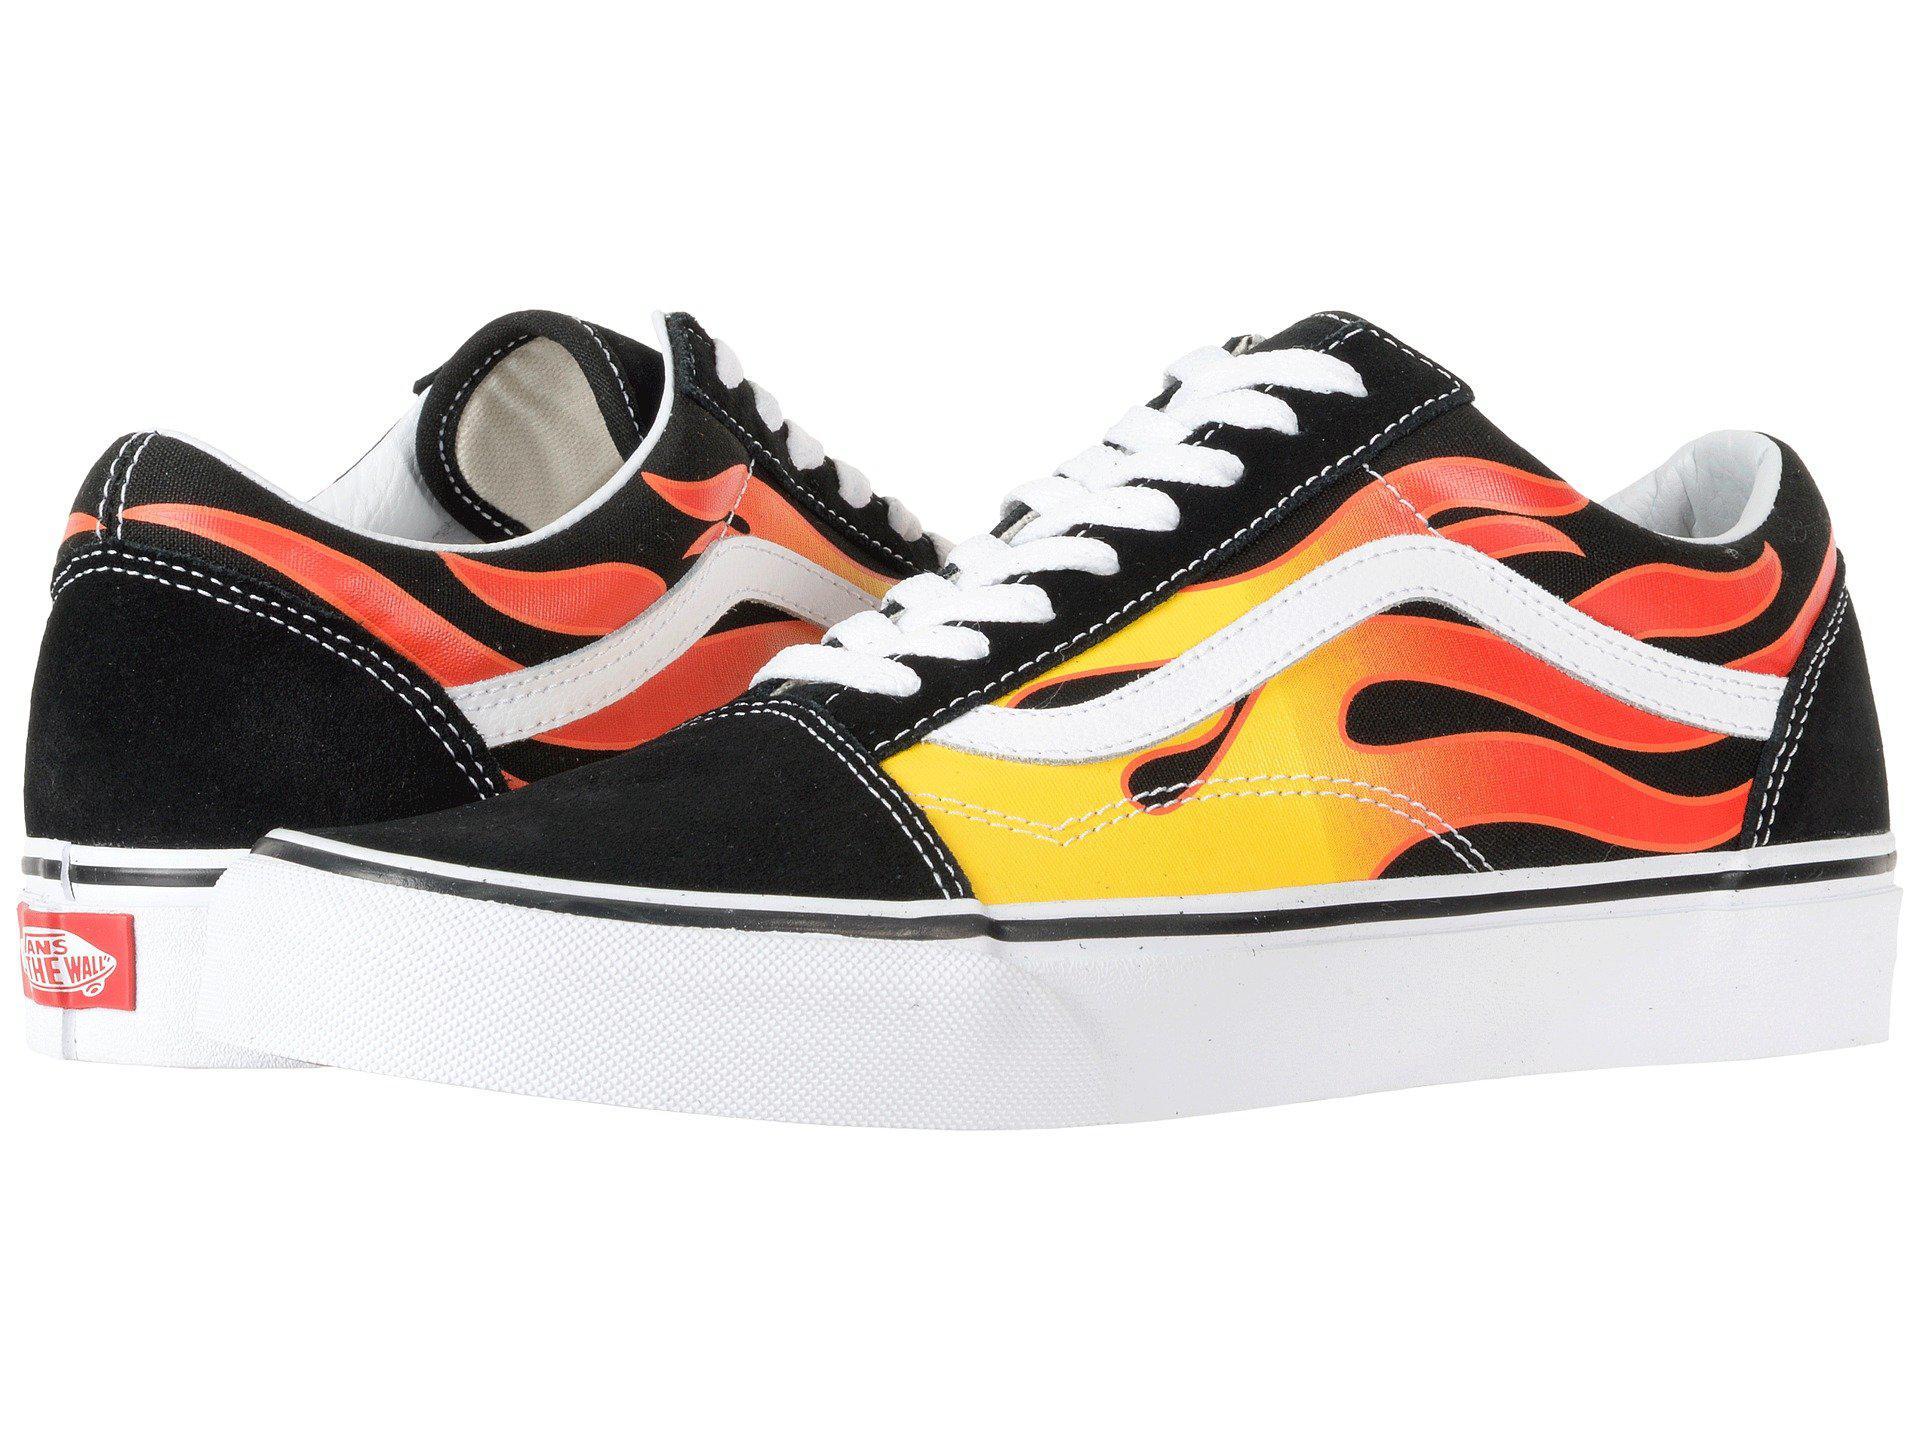 b7c88b29a49b Vans. Women s Black Old Skooltm ((pig Suede) Stormy Weather true White) Skate  Shoes